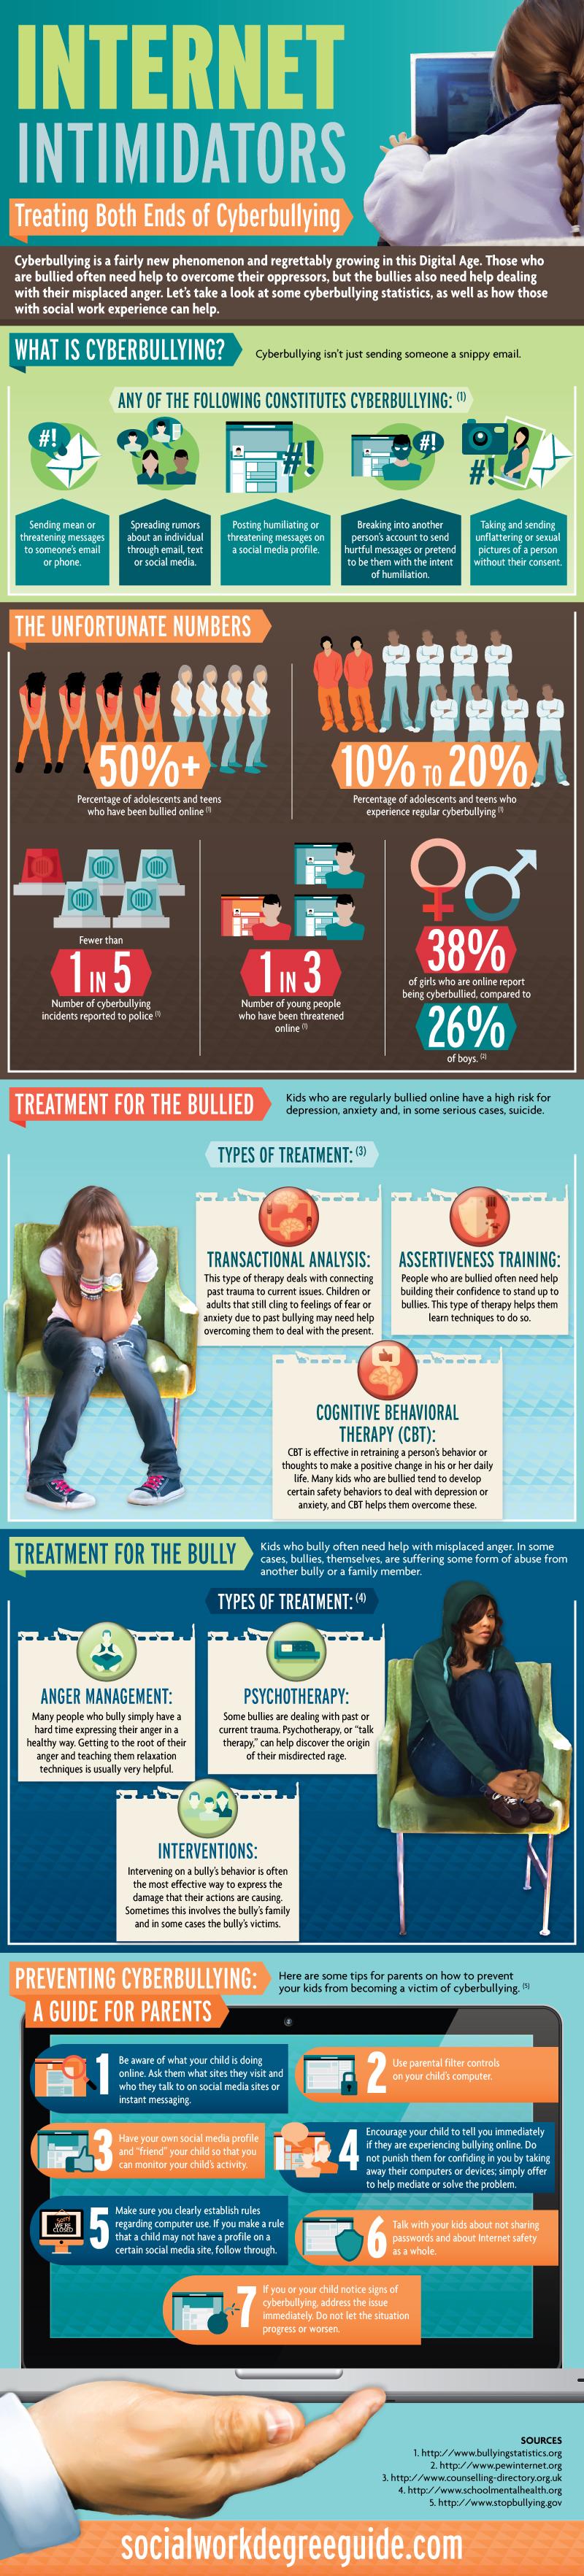 Internet Intimidators: Treating Both Sides of Cyberbullying